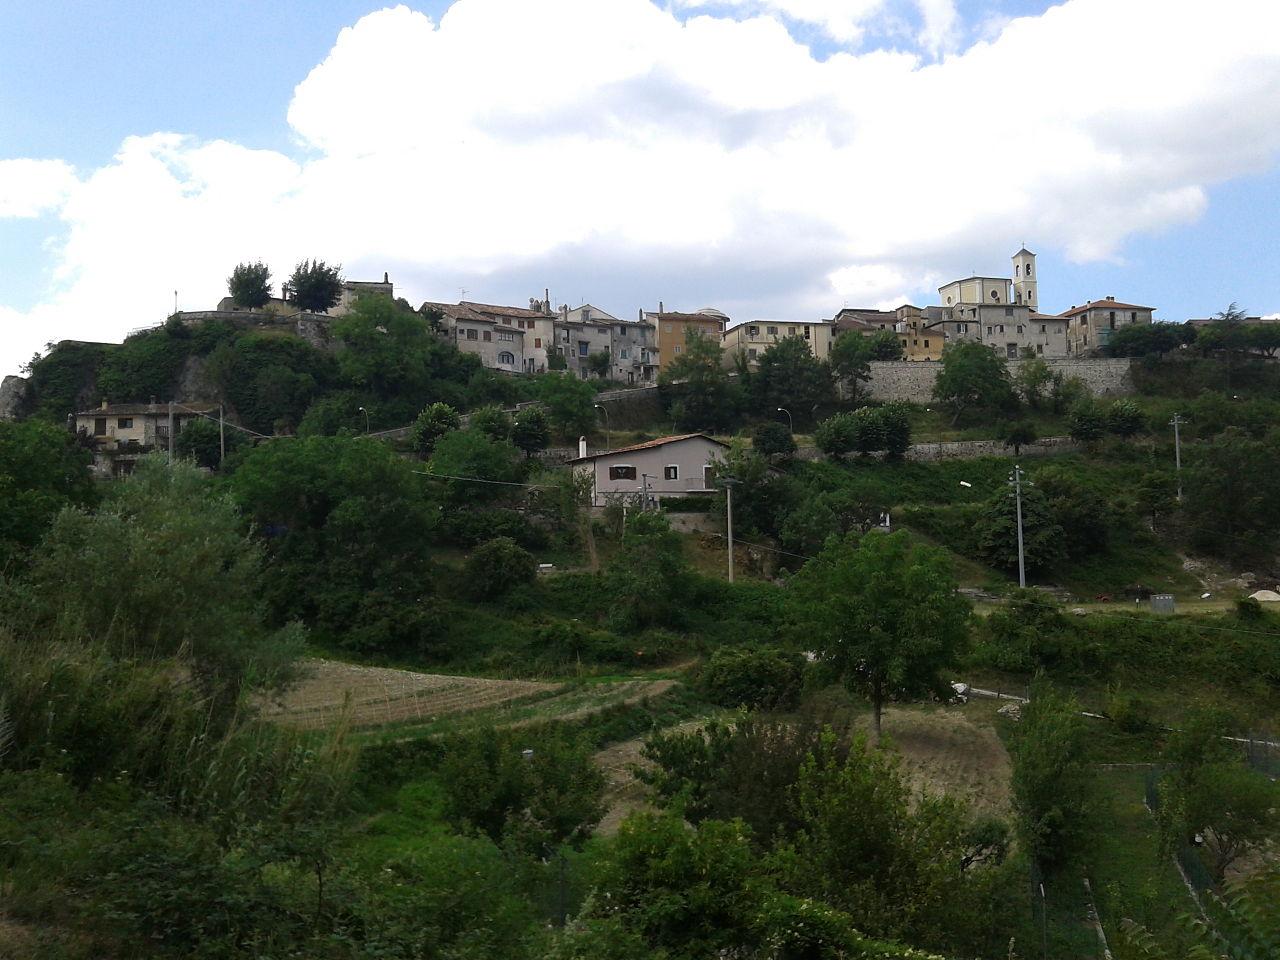 View of Civita d'Antino (or Antena)